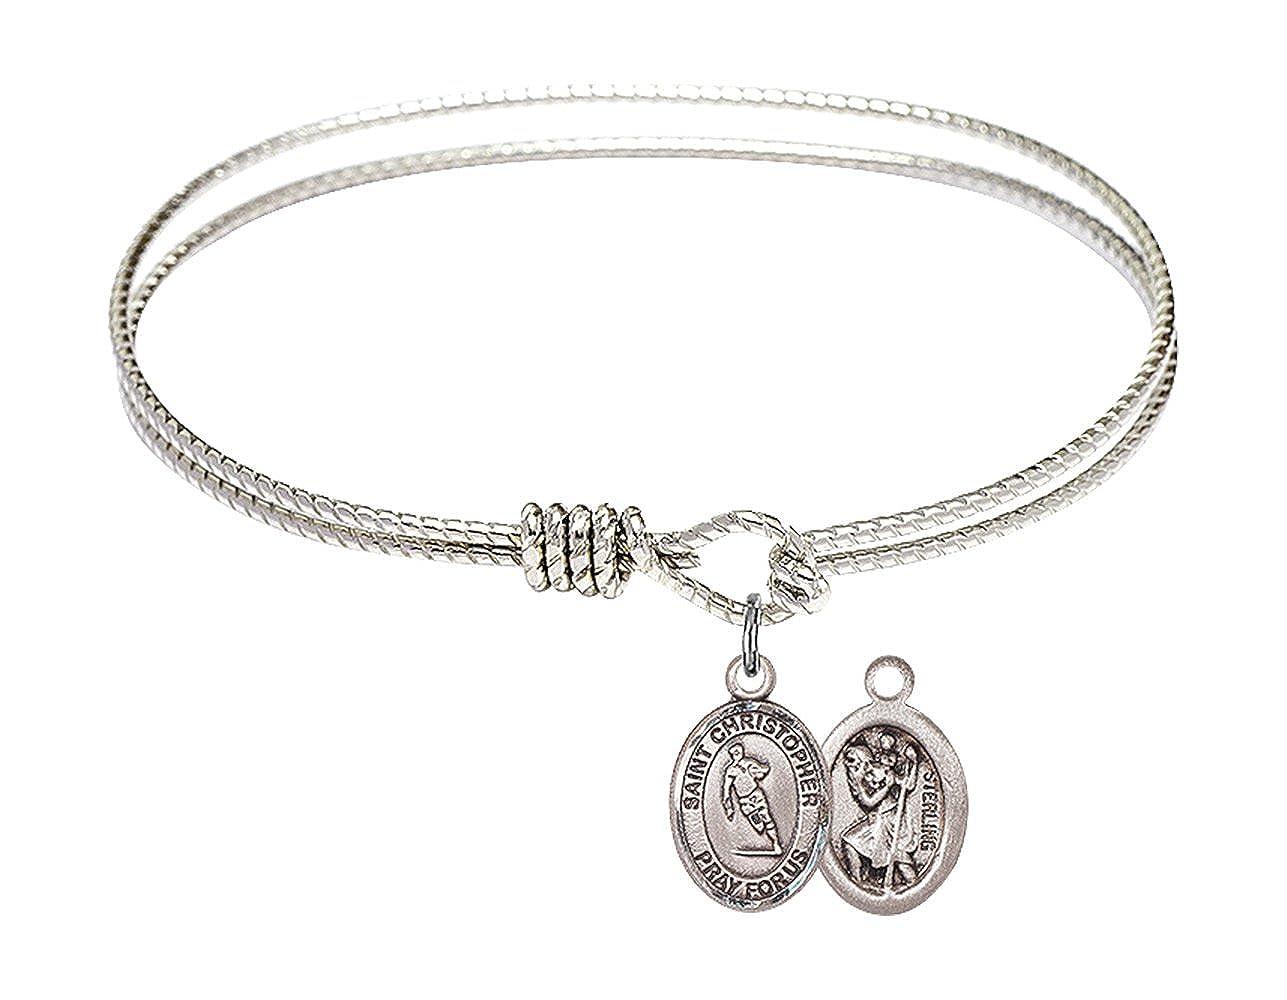 Christopher//Rugby Charm. DiamondJewelryNY Eye Hook Bangle Bracelet with a St